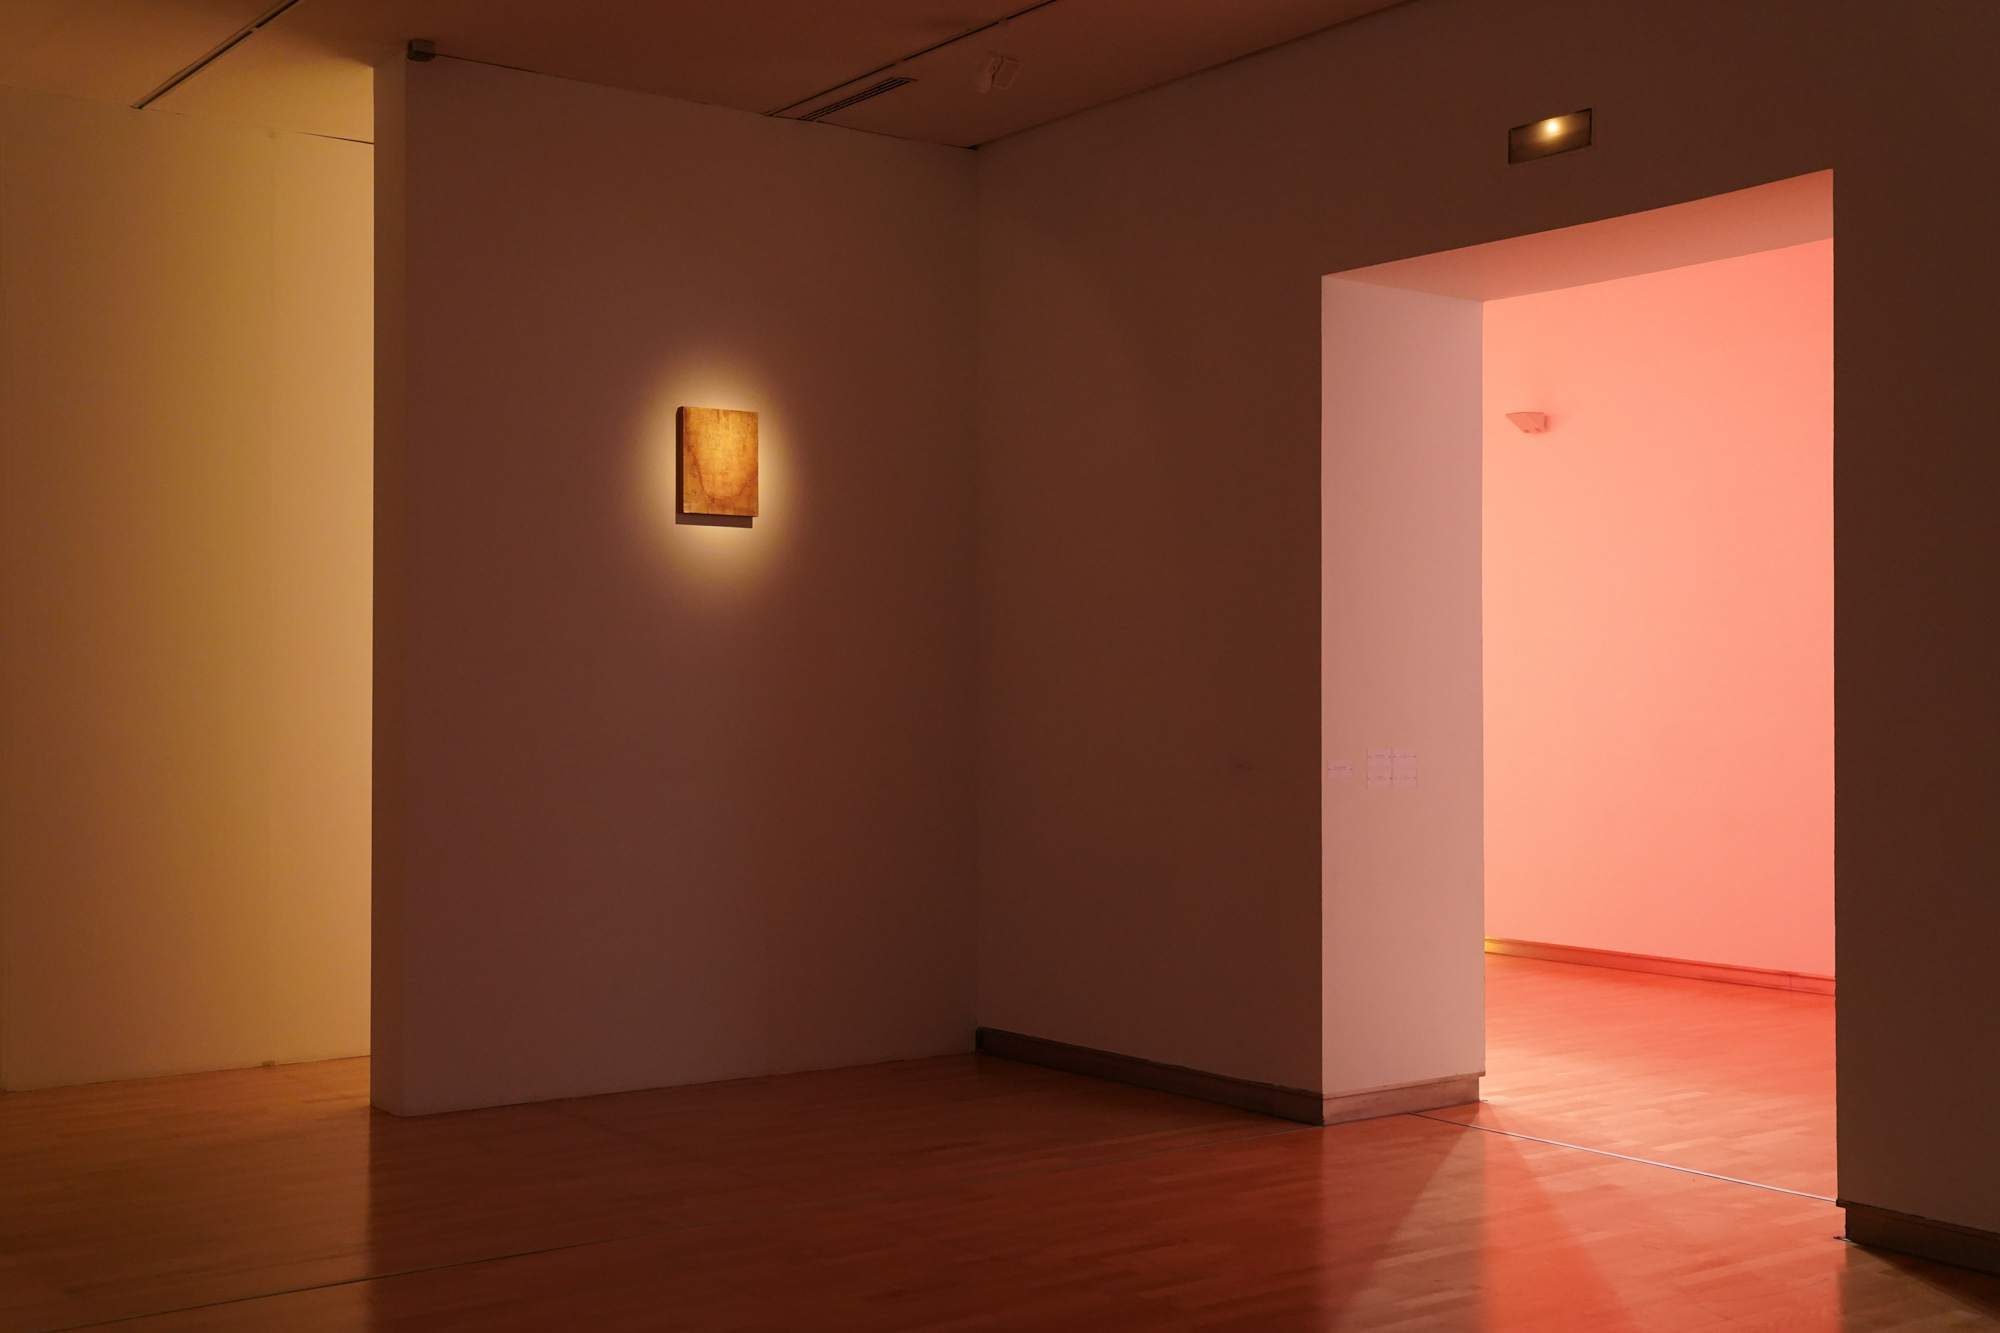 CaballeroCosmica-ExhibitionsPhoto-RubenRodrigo-70.jpg